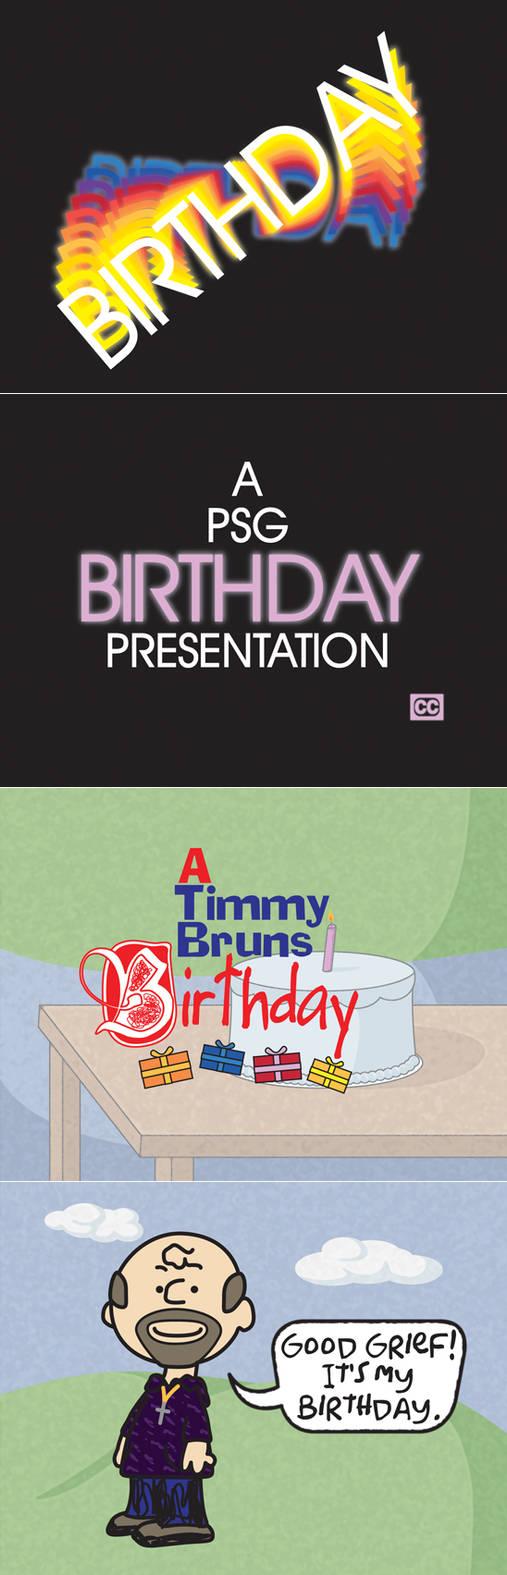 A Timmy Bruns Birthday